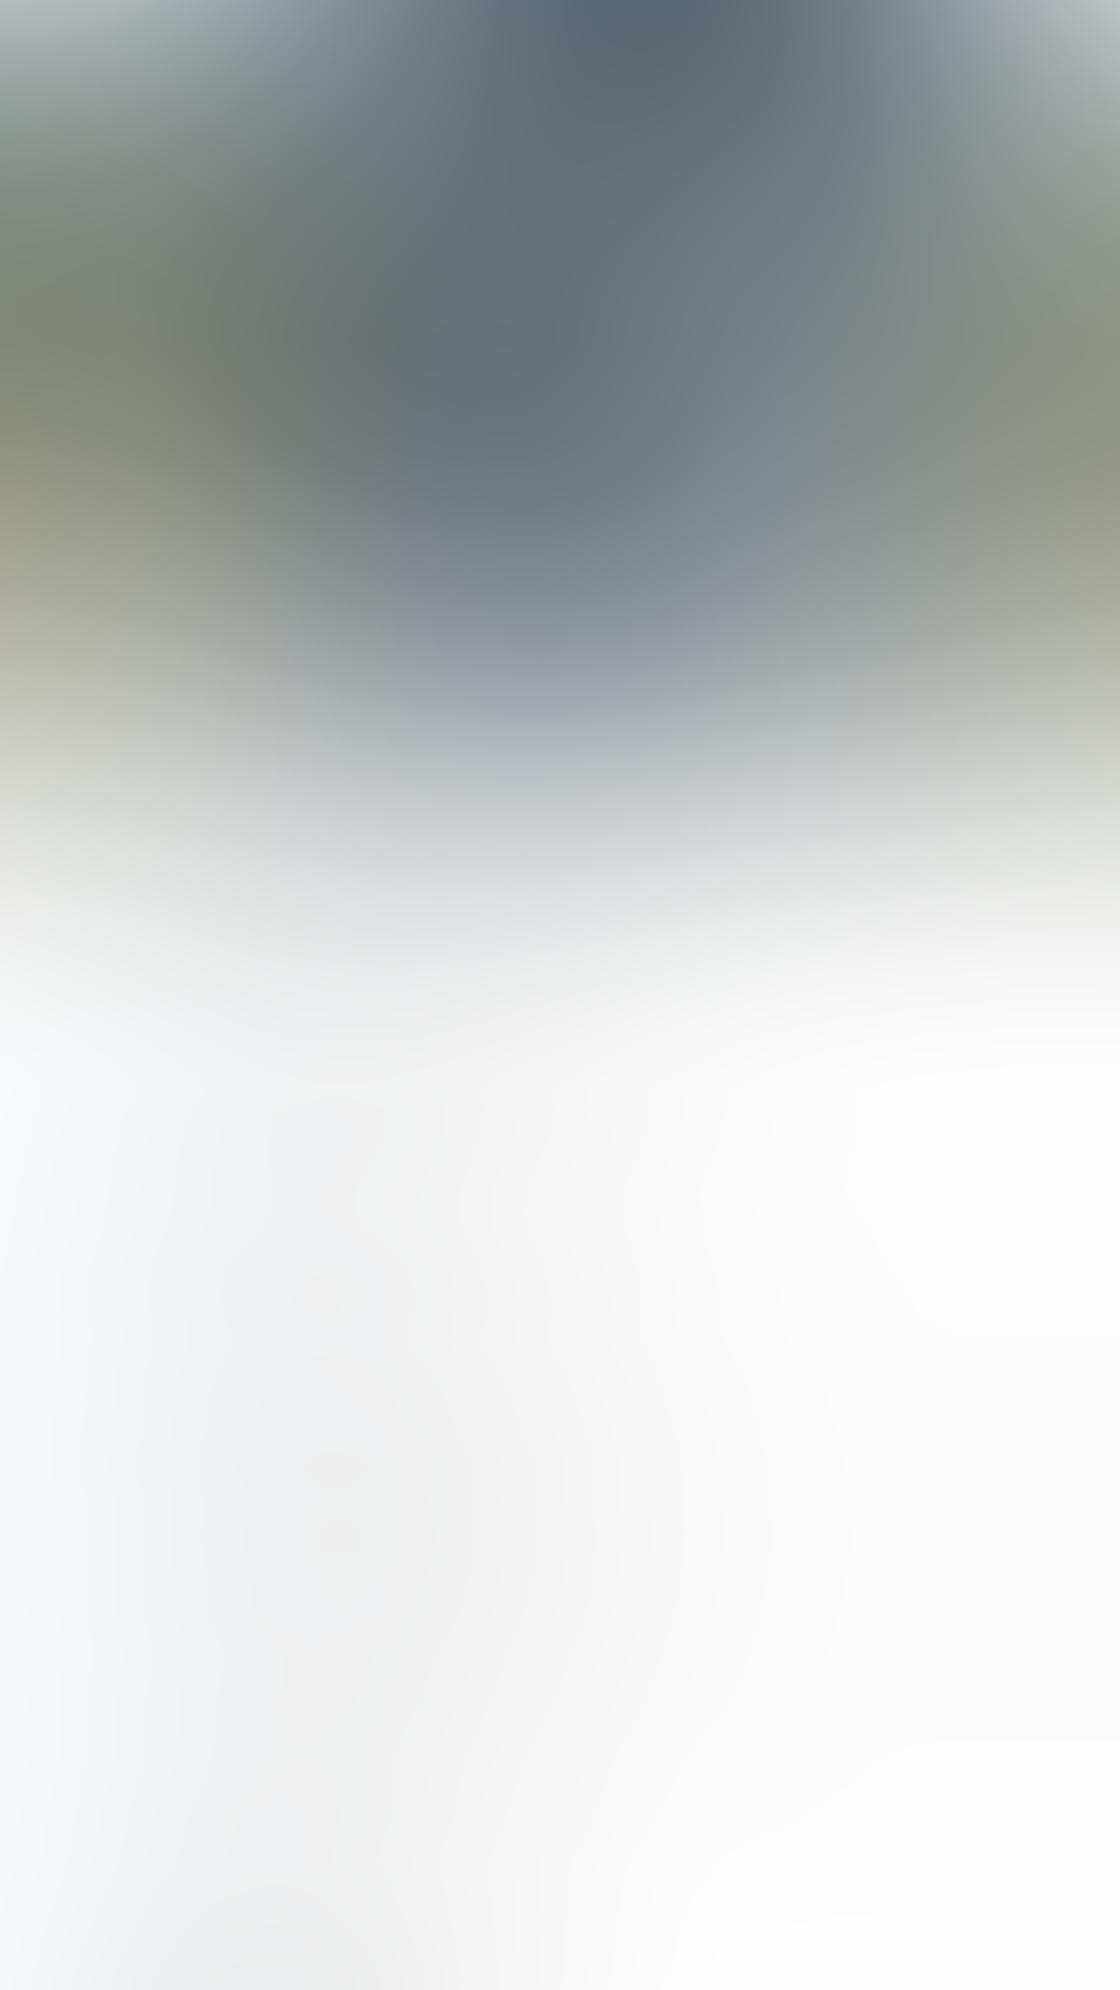 Pixelmator iPhone Editing App 9